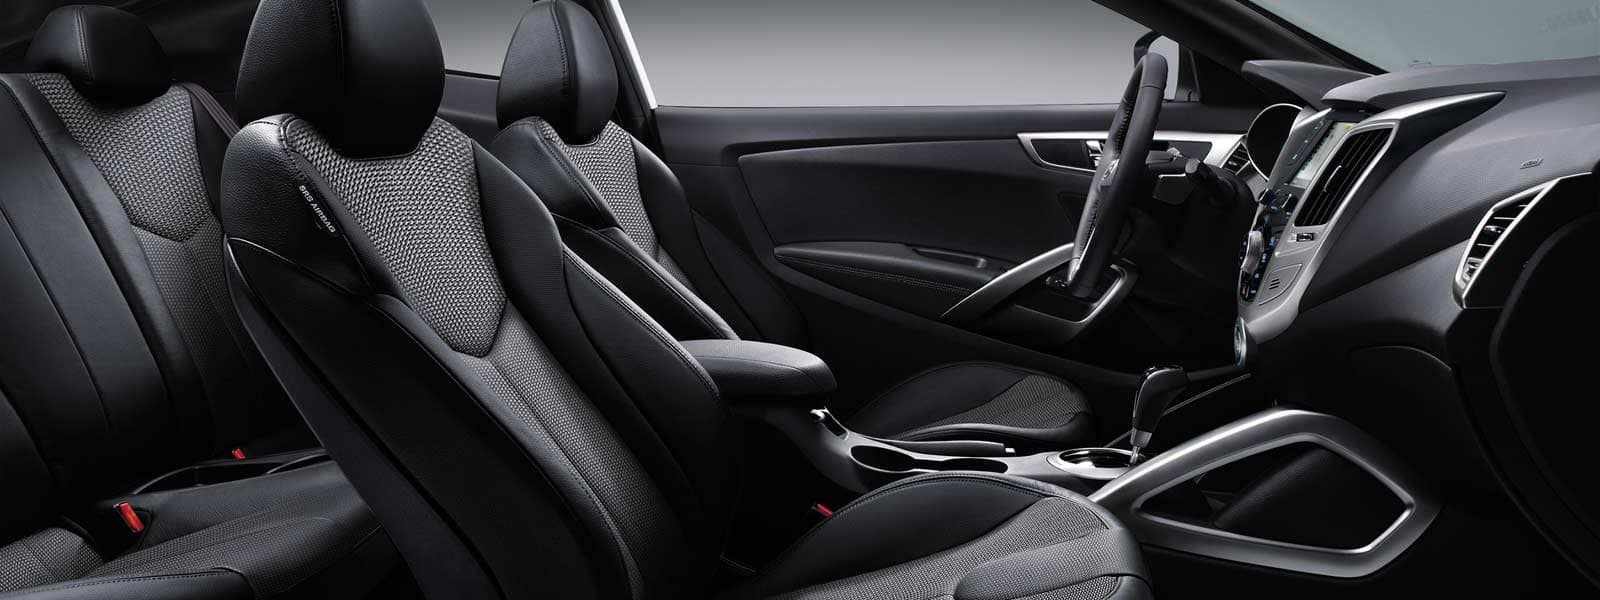 2016 Veloster Tech Black 0035 Seats